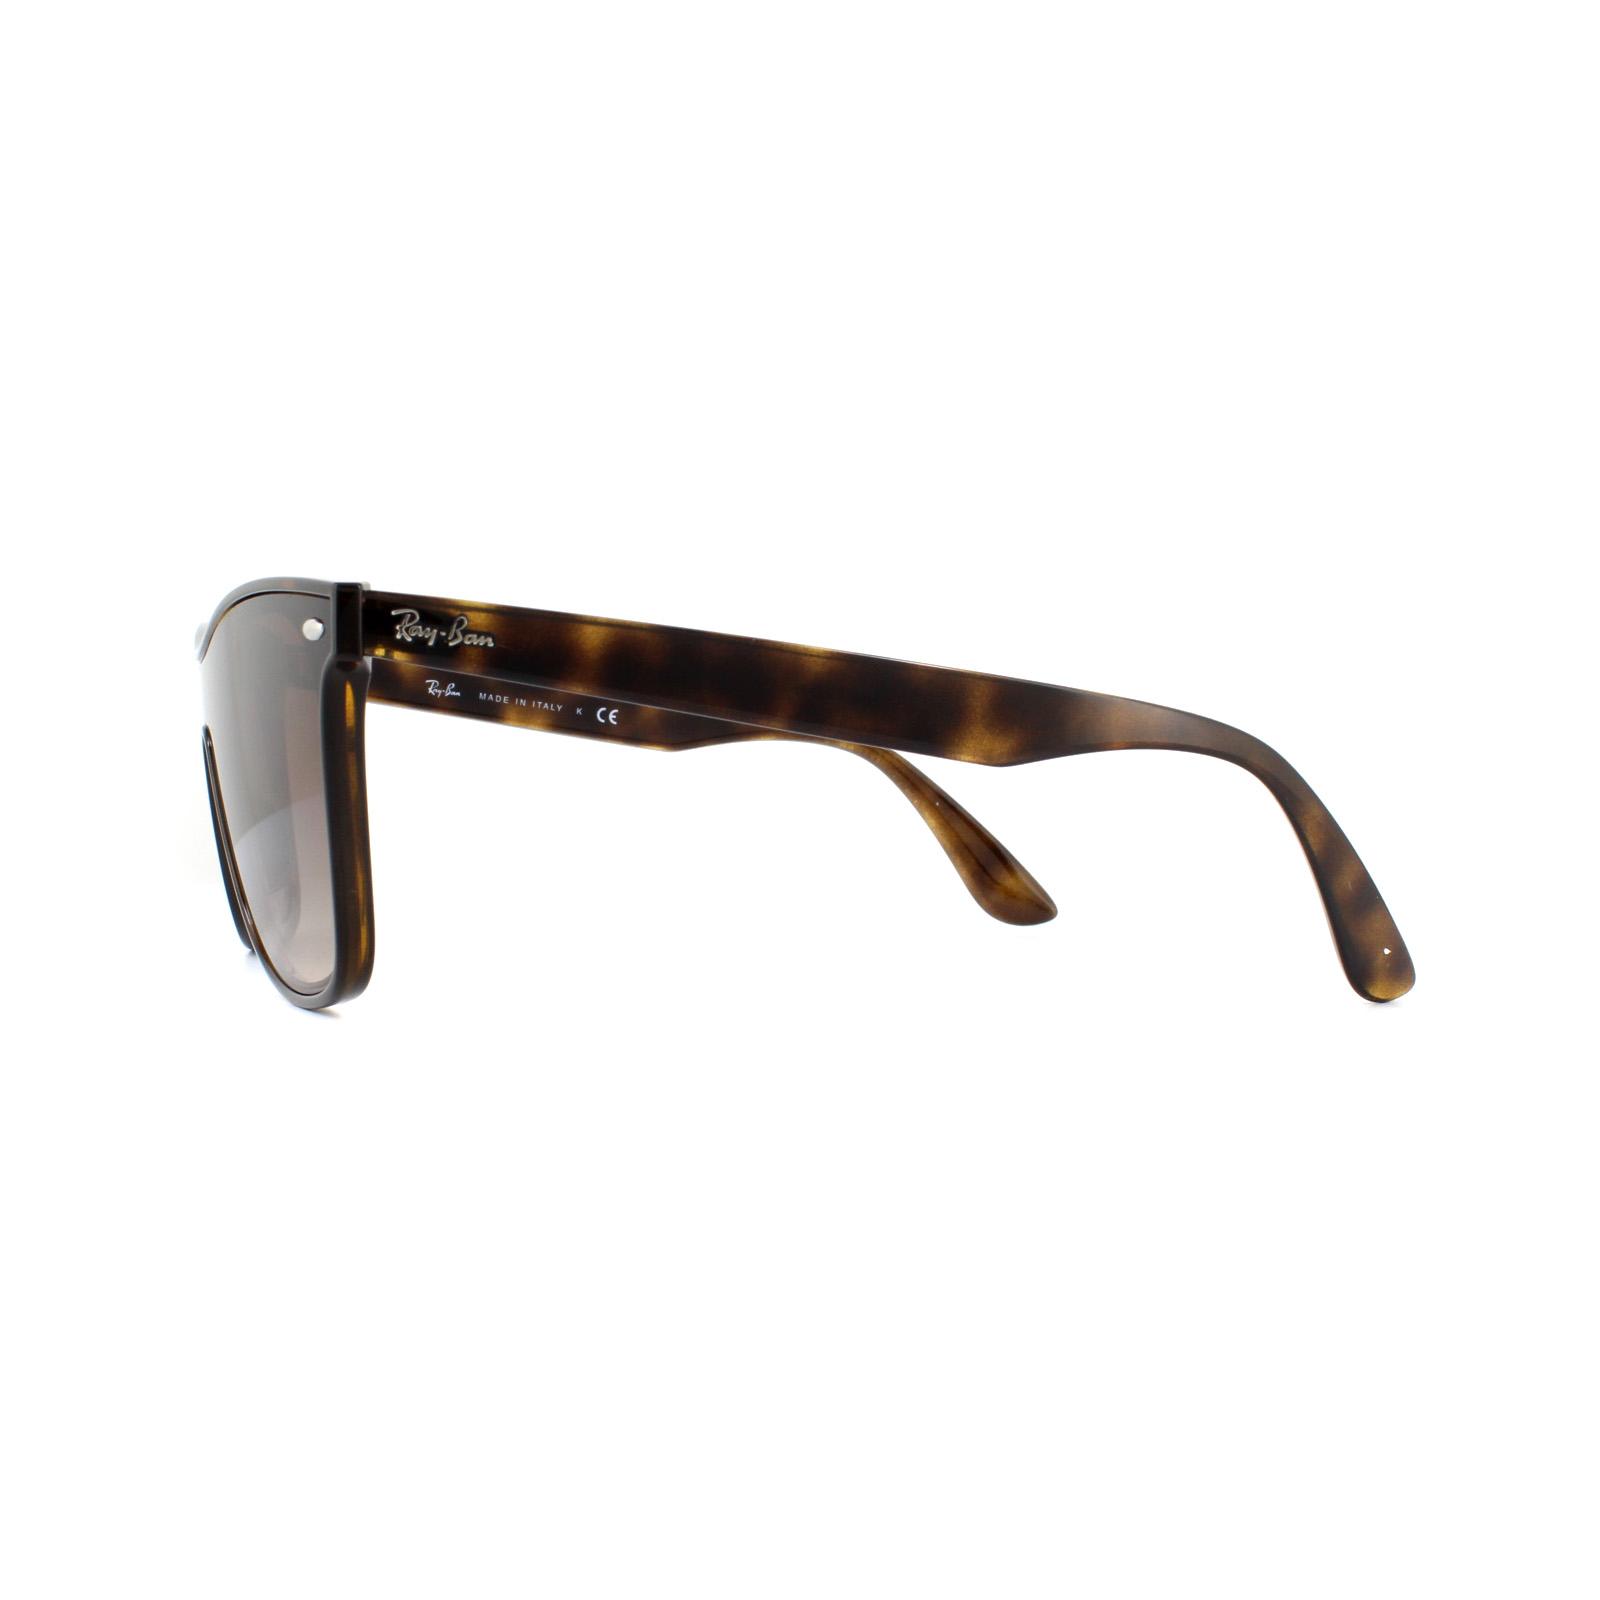 ae3811490d5 Sentinel Ray-Ban Sunglasses Blaze Wayfarer 4440N 710 13 Light Havana Brown  Gradient